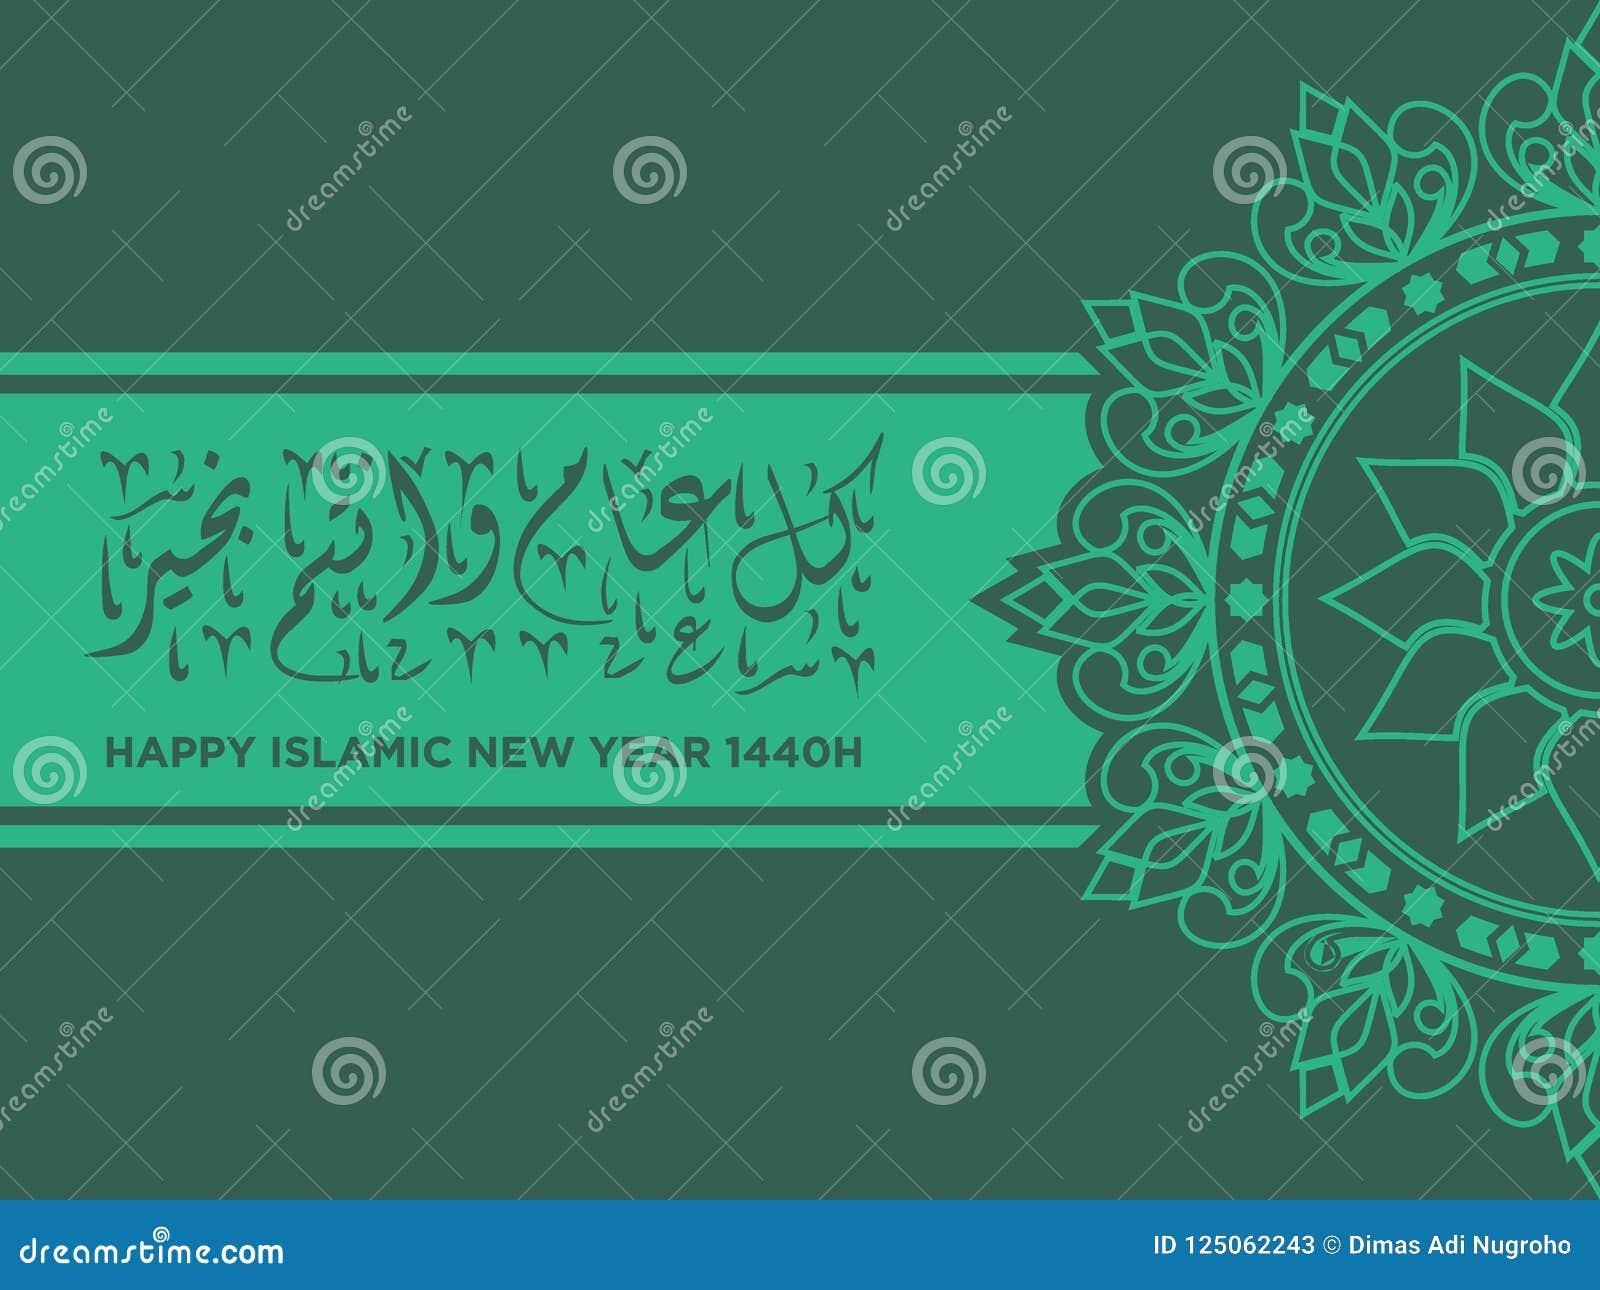 Happy Islamic New Year 1440 HIjri Greeting Background Stock